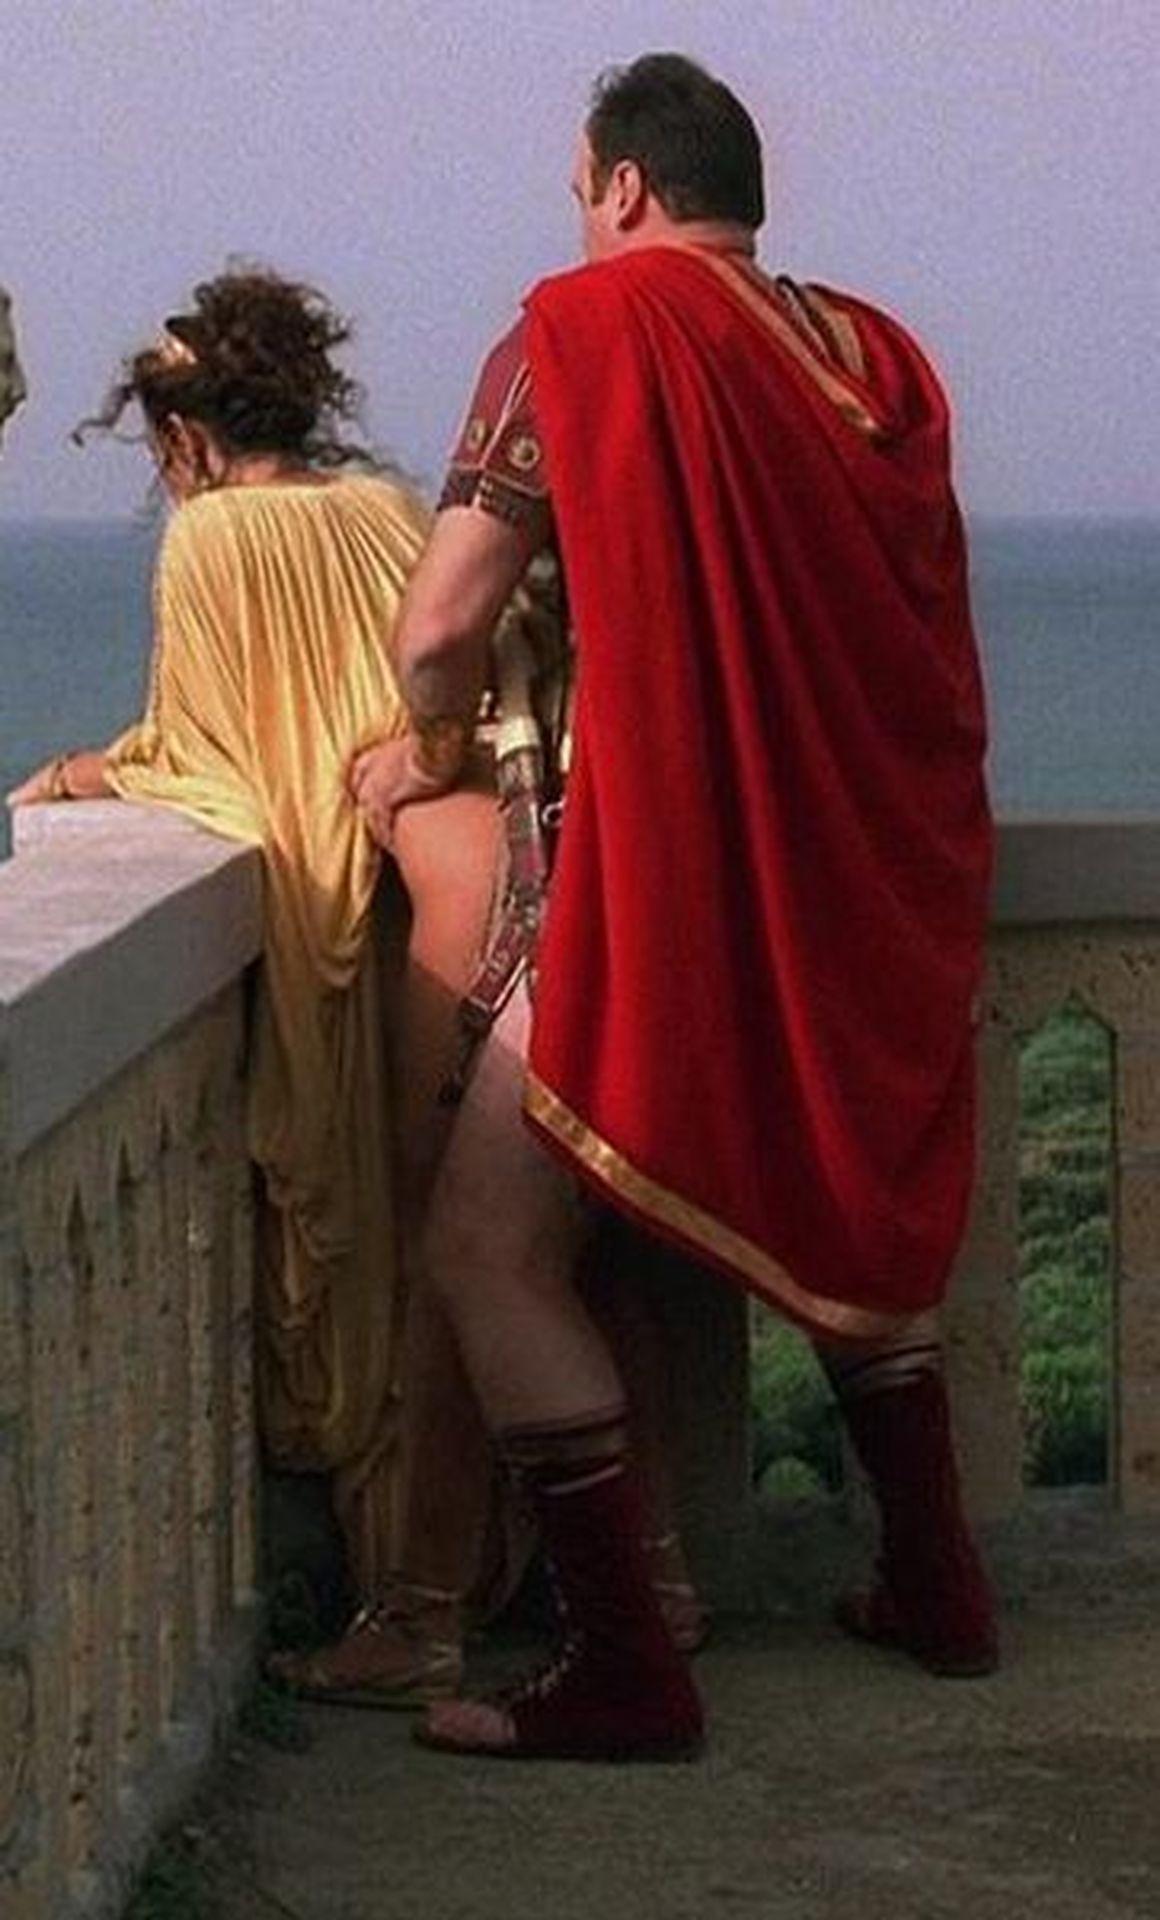 milos-nude-photo-sofia-women-licking-hairy-pussy-gif